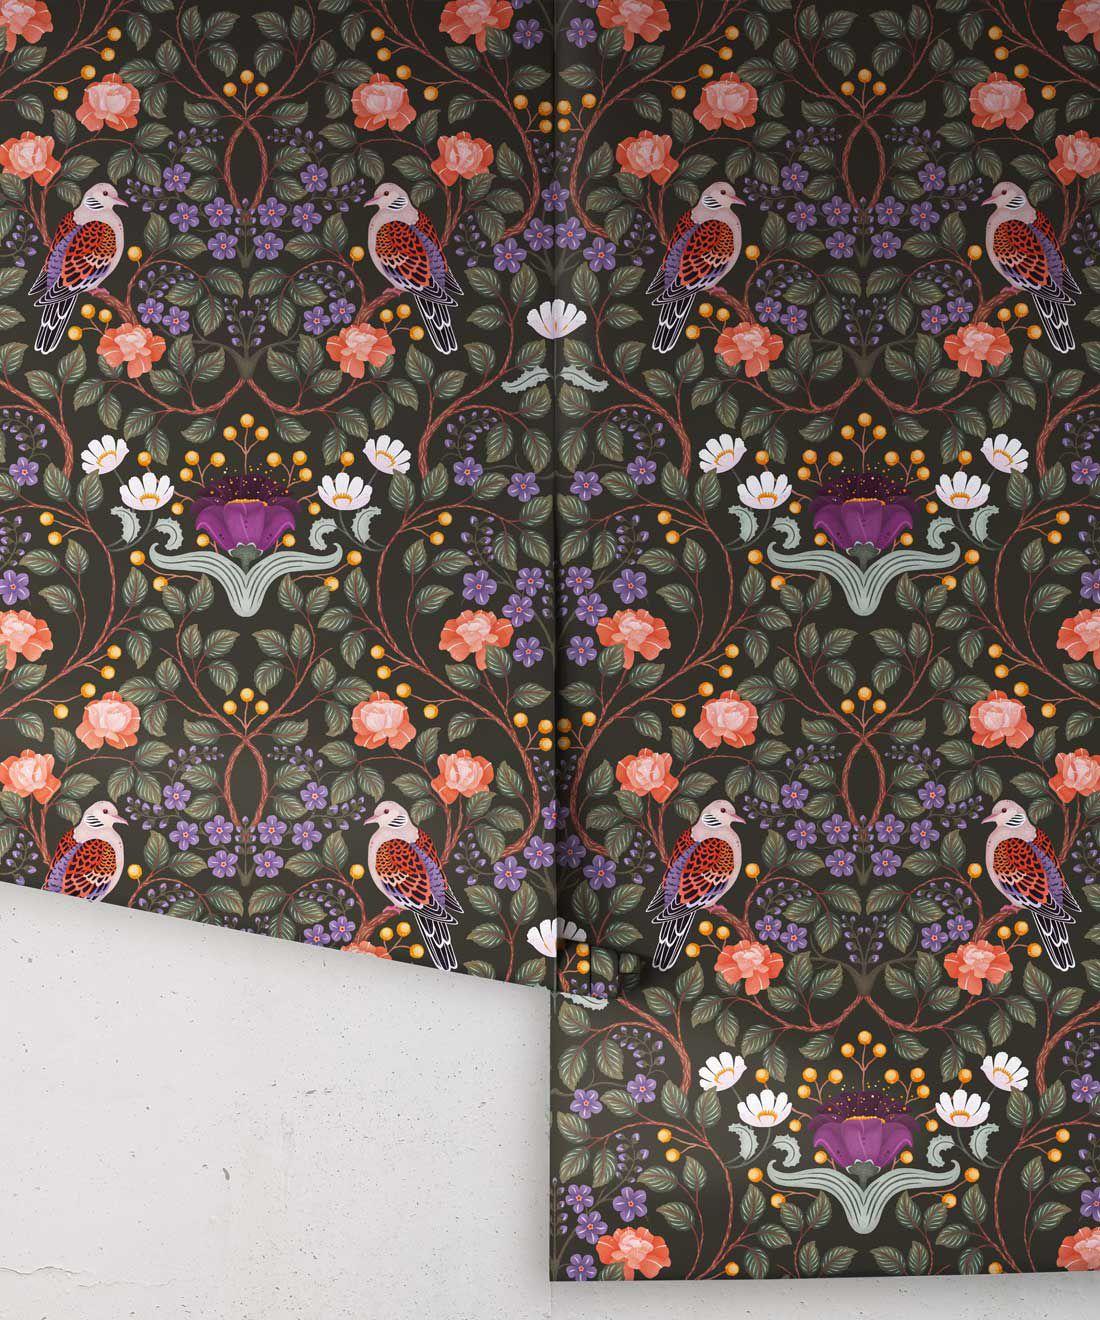 Turtle Doves Wallpaper • Bold Colorful Bird Wallpaper • Original •Rolls